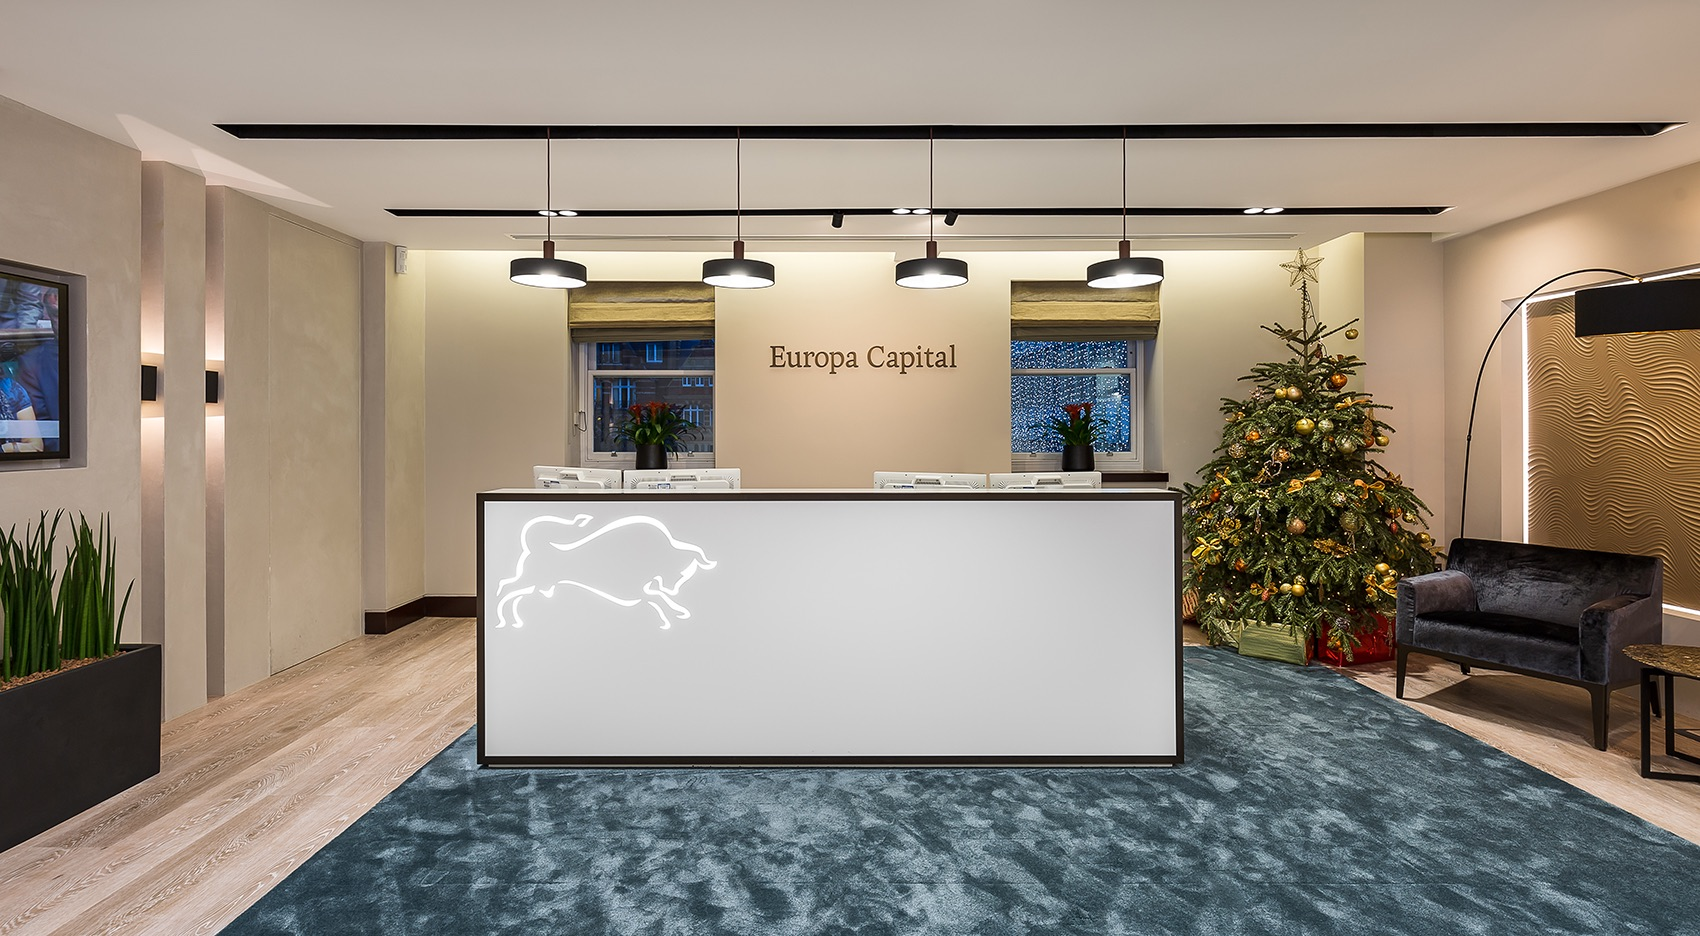 europa-capital-london-office-1